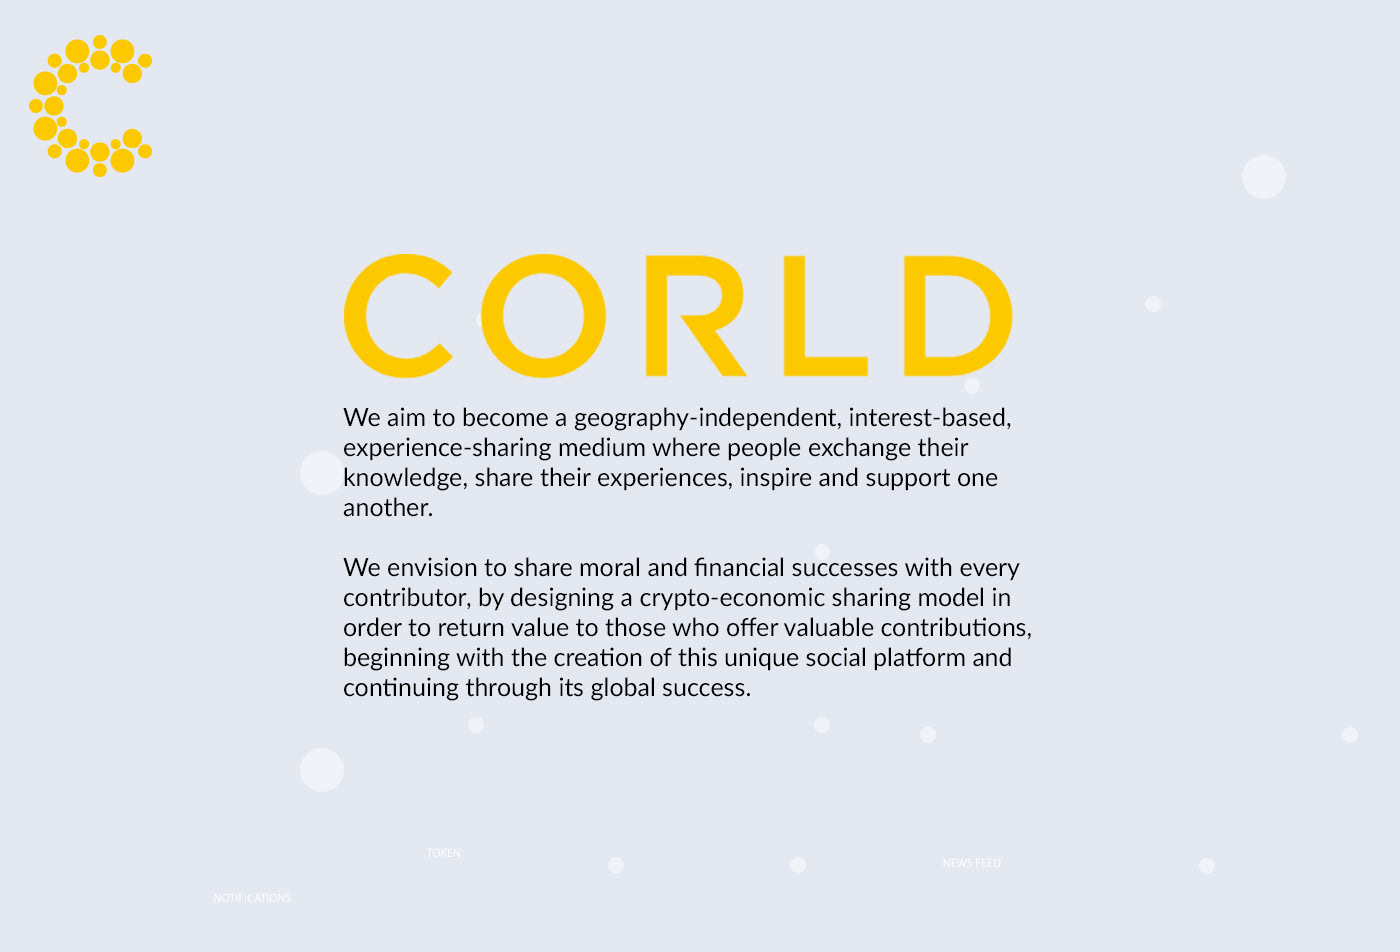 CORLD Social Networking App on Behance